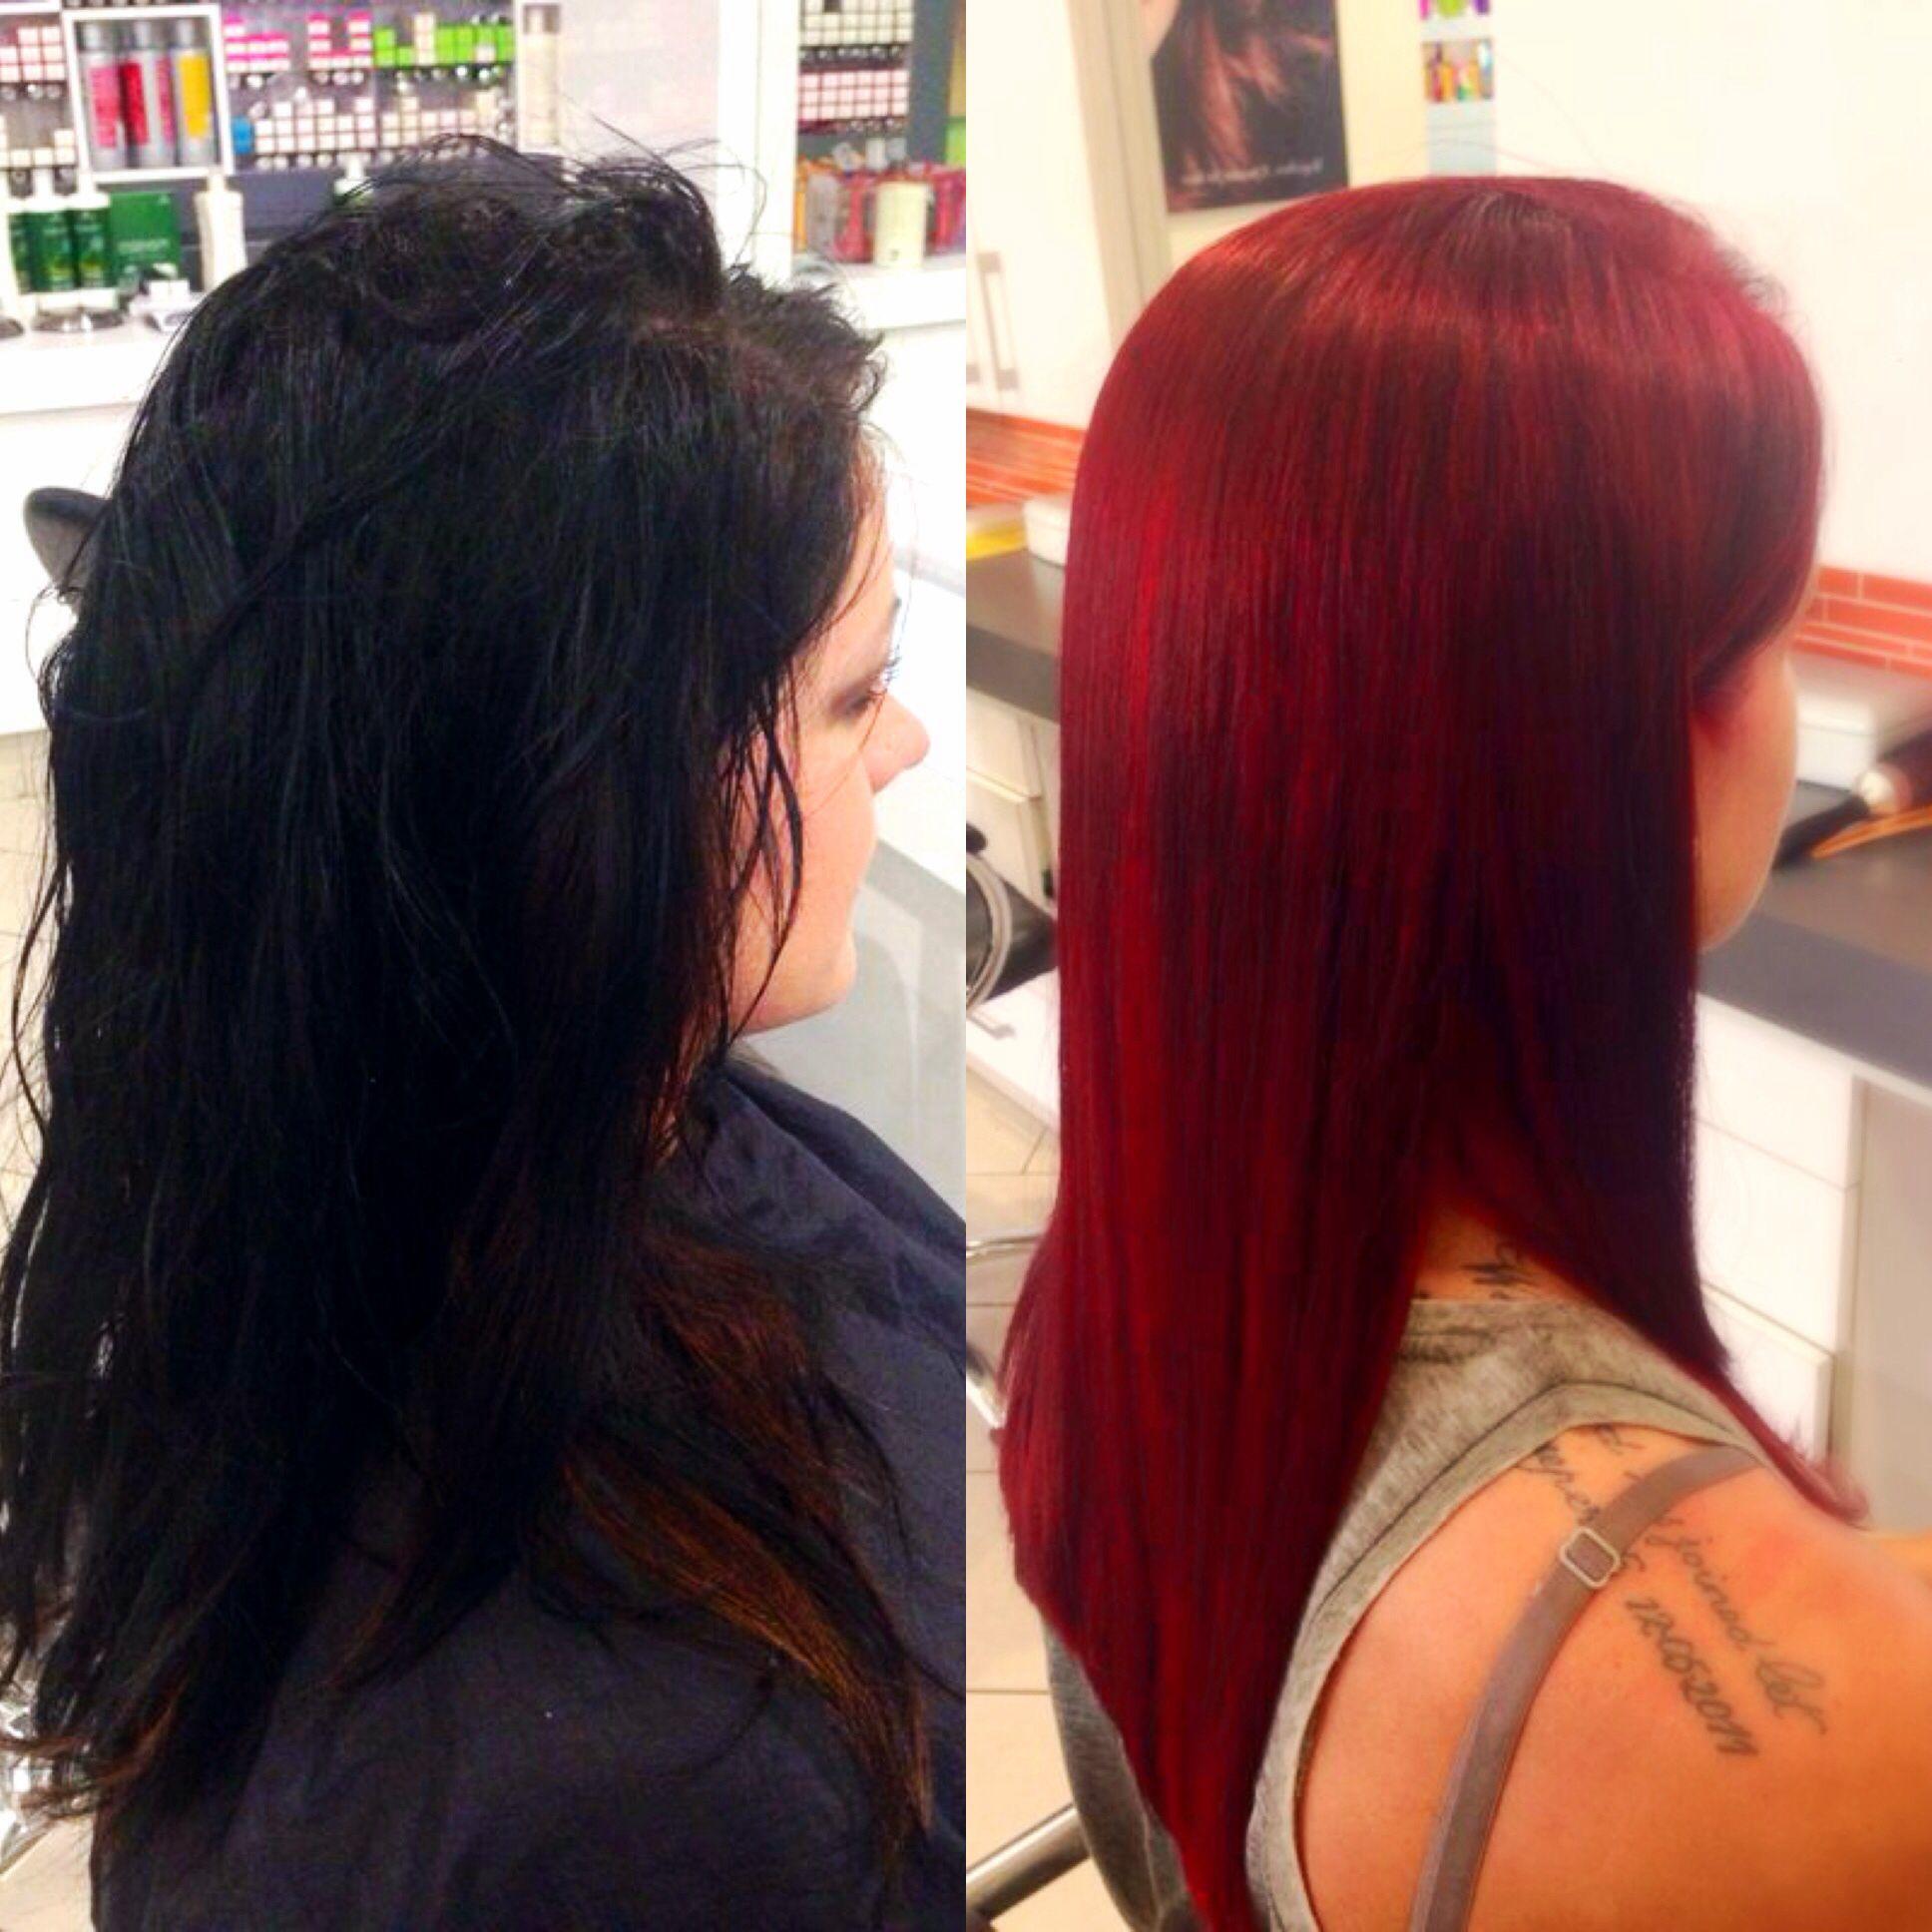 Amazing Hair Transformation From Black Box Hair Dye To A Stunning Red Box Hair Dye Cool Hairstyles Hair Transformation